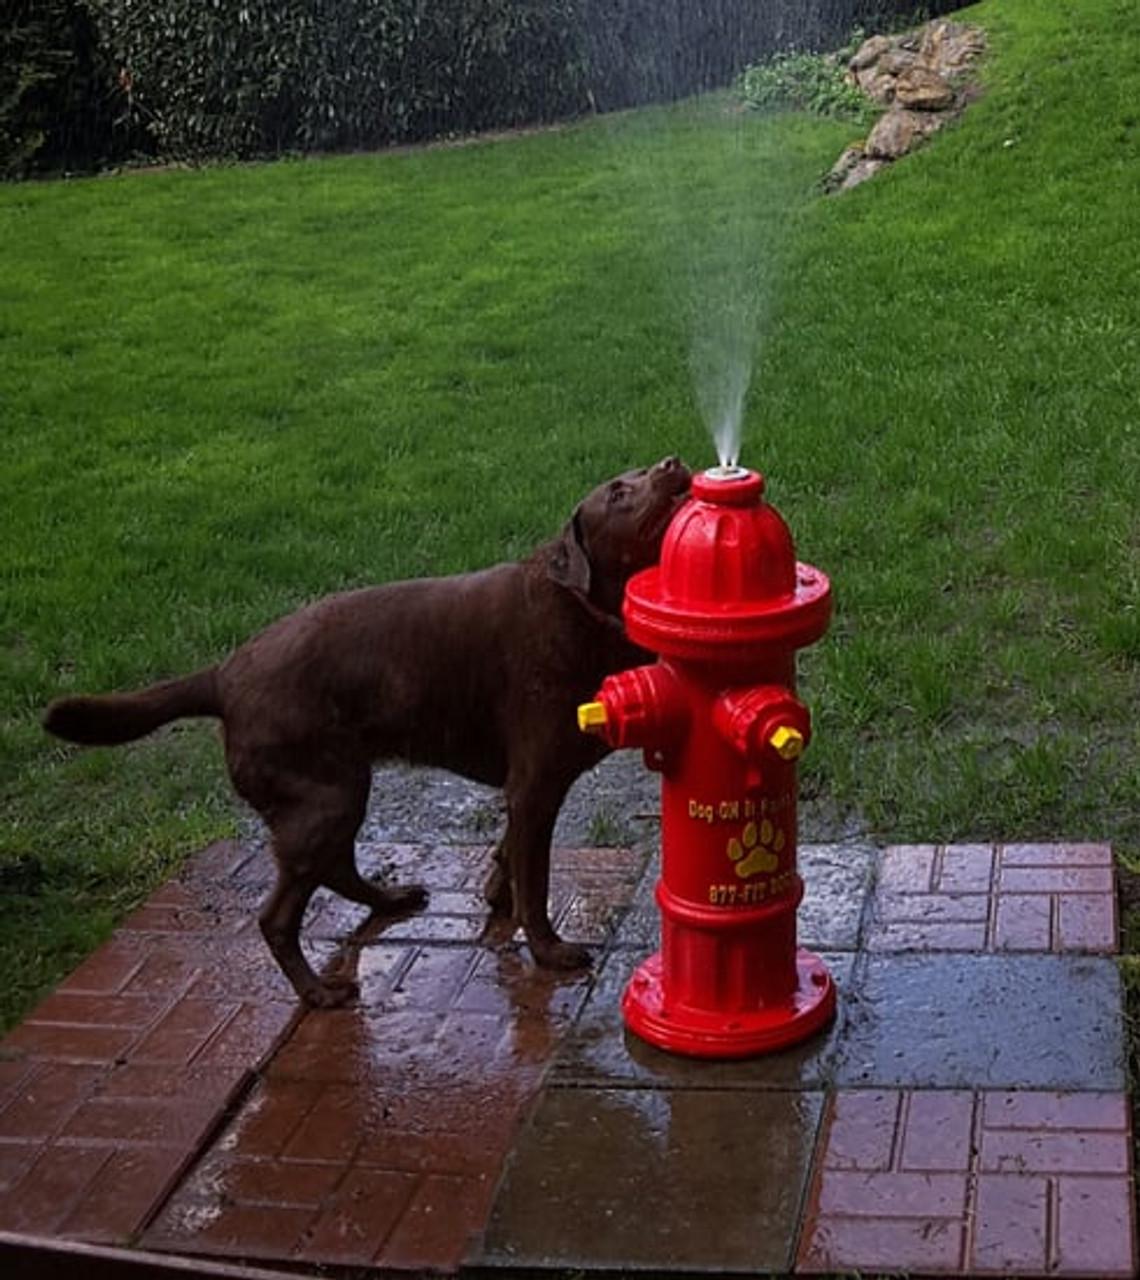 Top Spray Hydrant